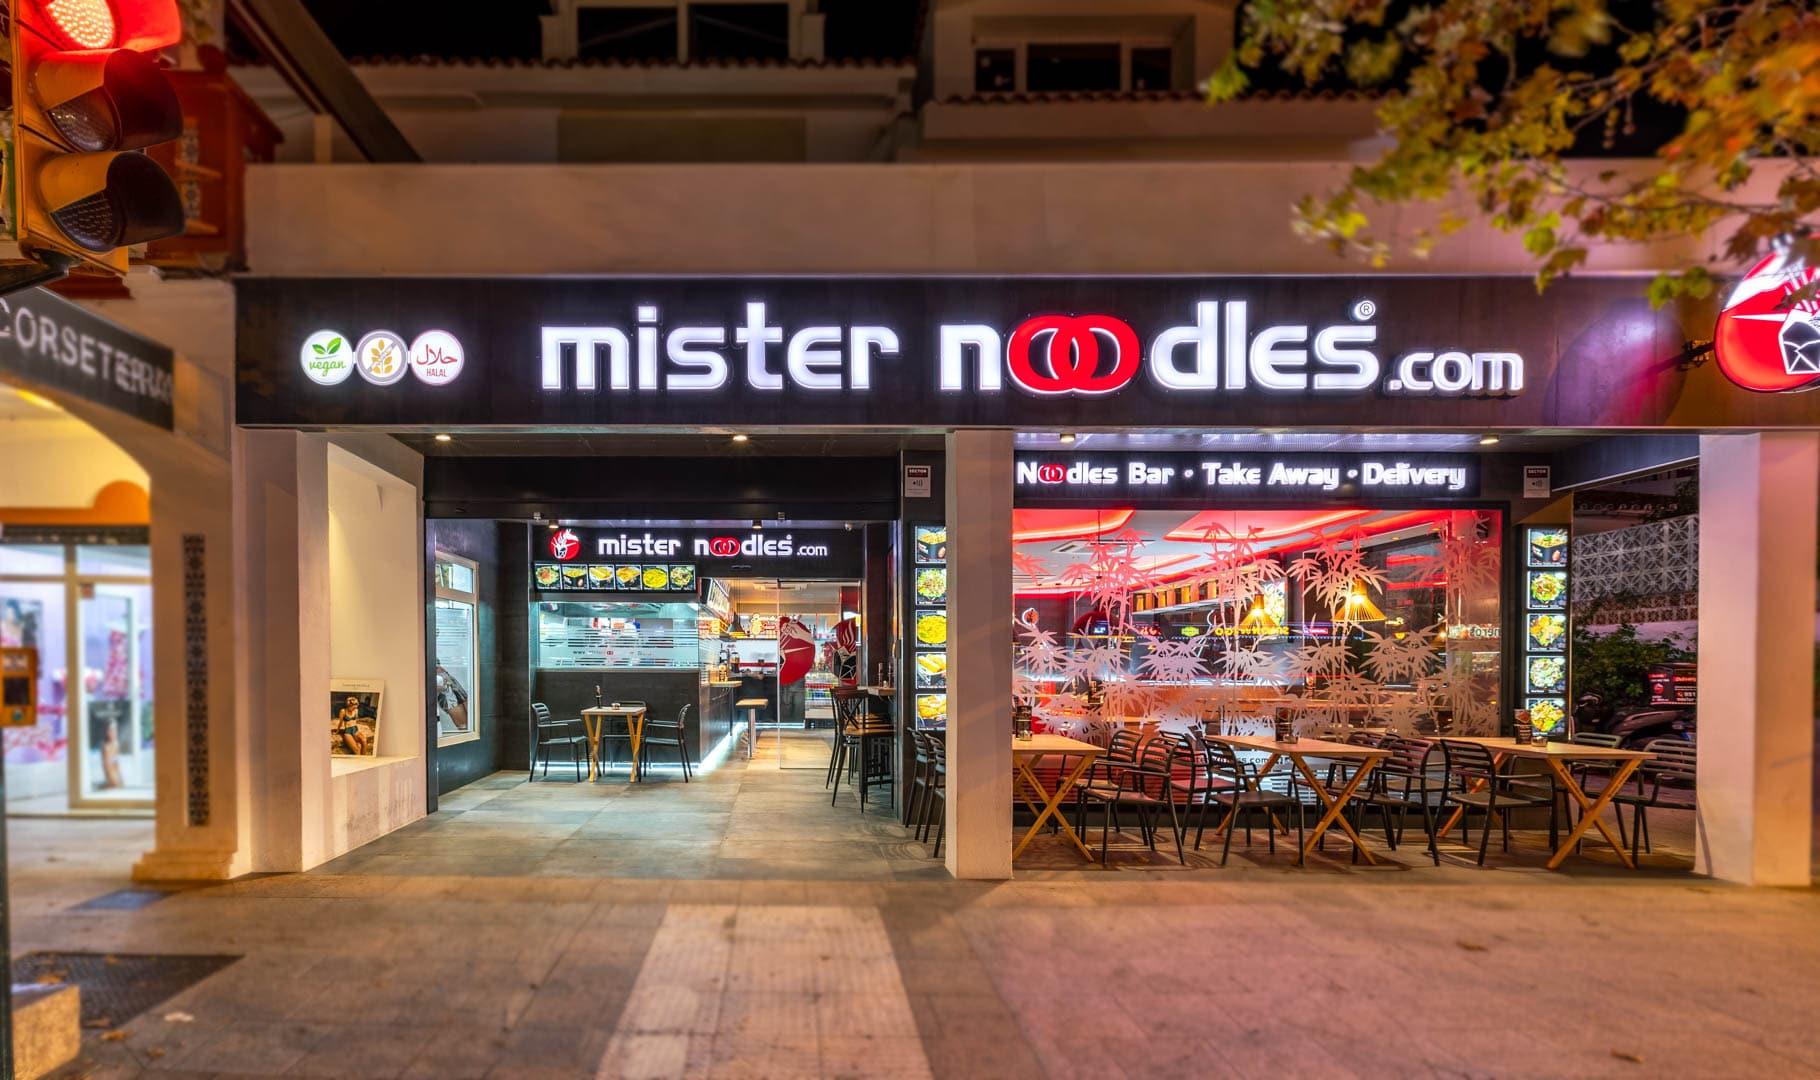 Mister Noodles Benalmadena Exterior (1)